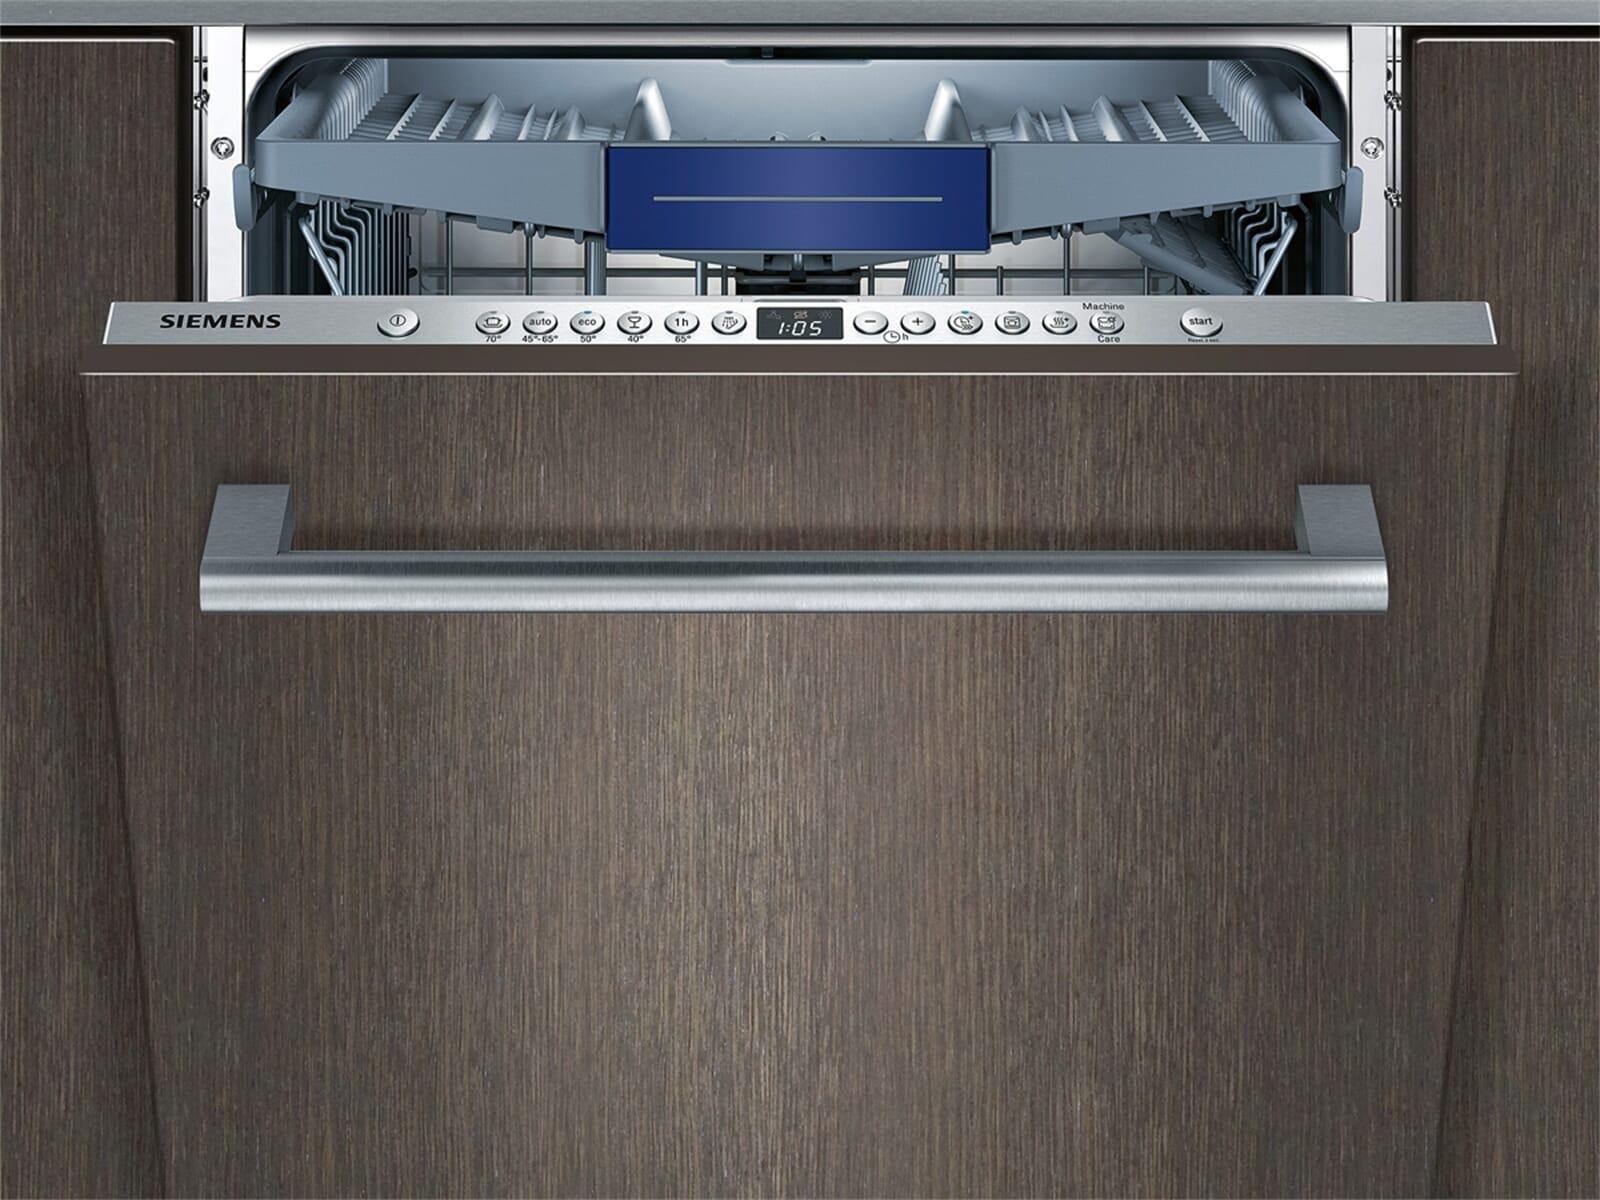 Siemens Kühlschrank Datenblatt : Siemens sx me vollintegrierbarer einbaugeschirrspüler xxl